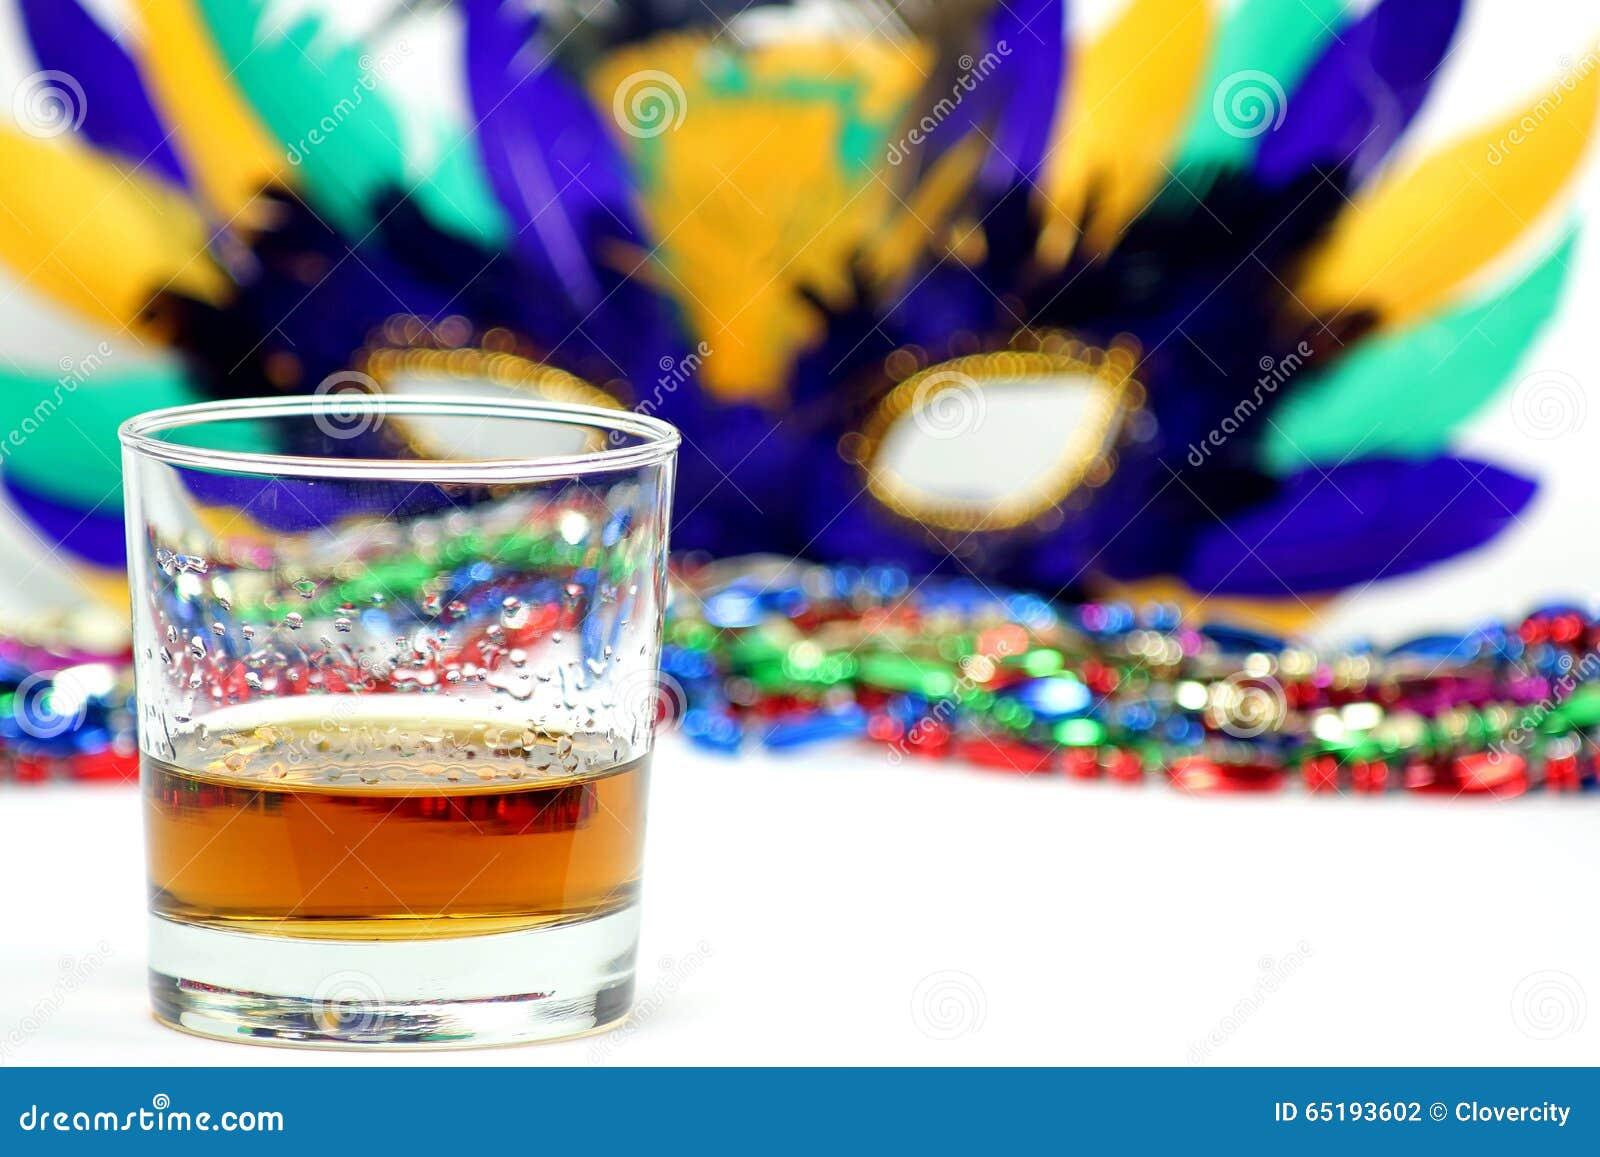 Bourbon, Staranny z koralikami i ostatki maską